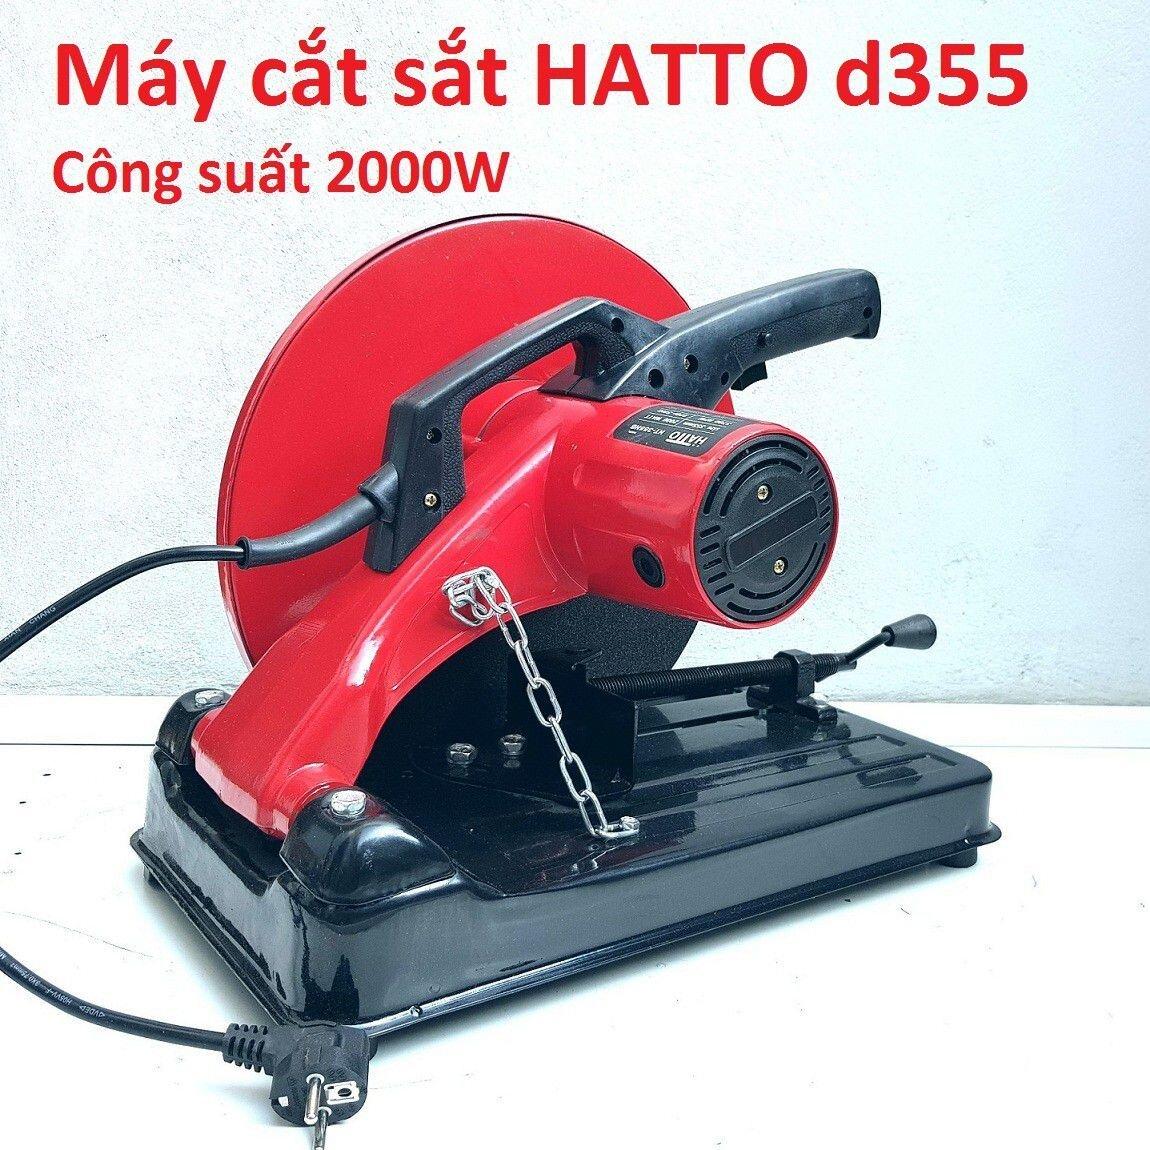 Máy cắt sắt Hatto d355, 2000W